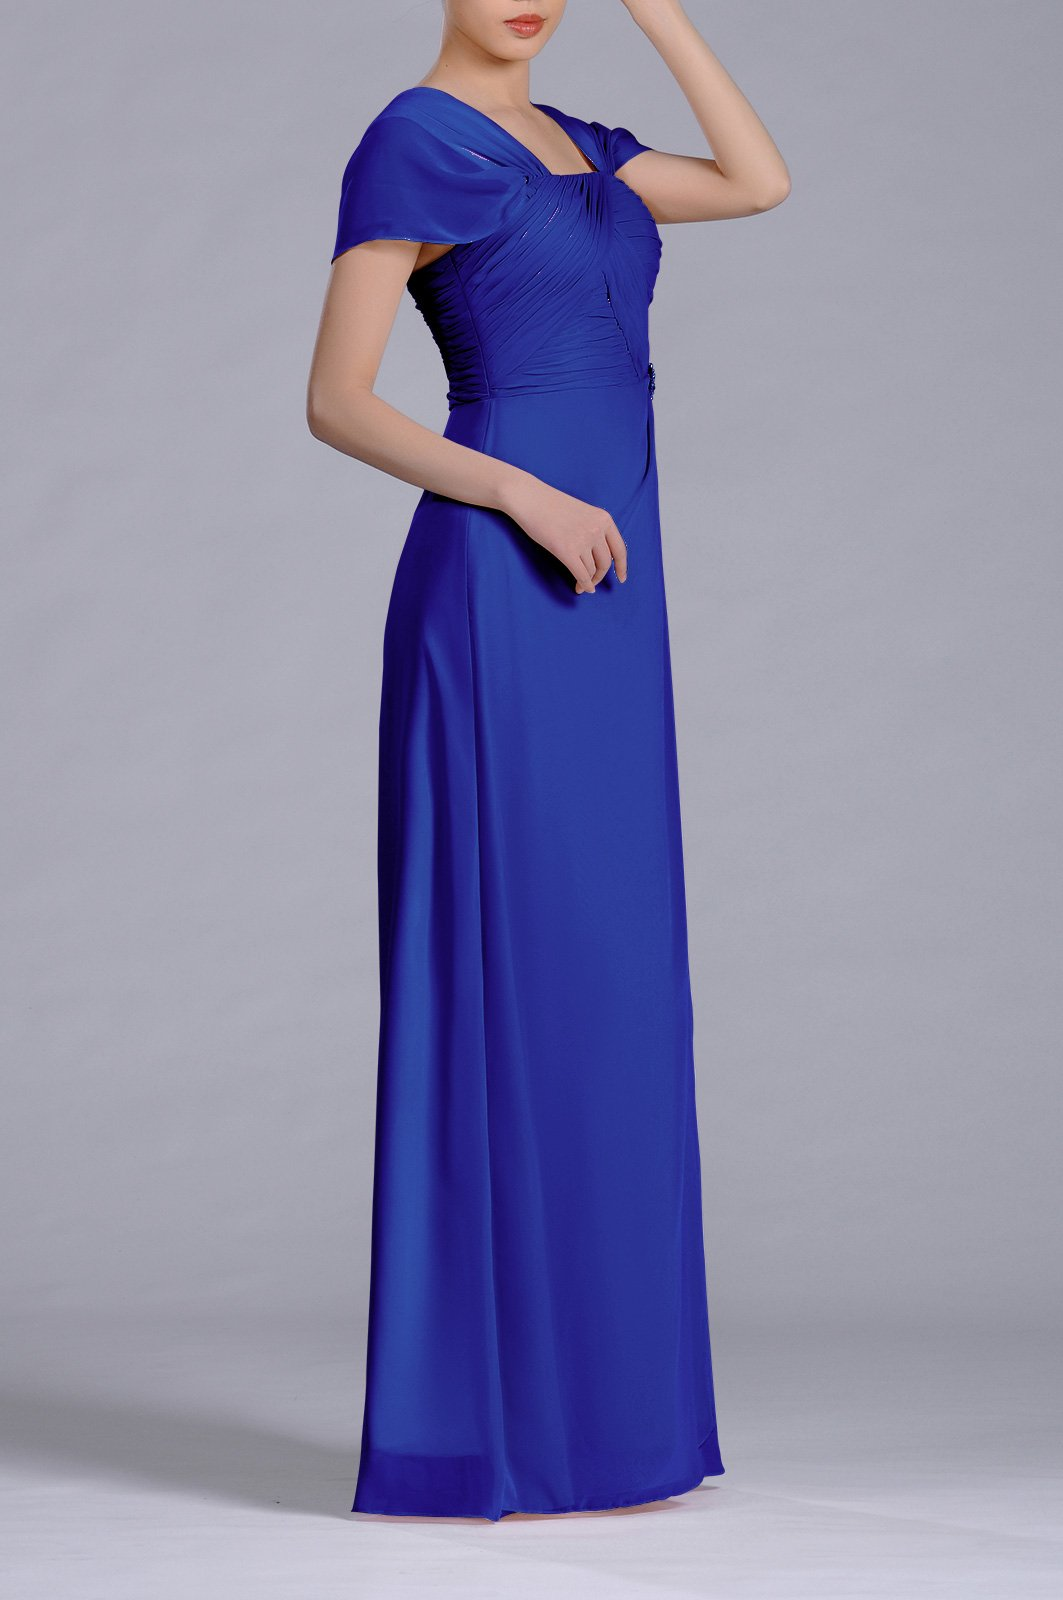 65ee68862f5b Home/Brands/Adorona Dresses/Formal Pleated Chiffon Bateau Sleeveless Sheath  Long Mother of The Bride Groom Dress, Color Royal Blue,20W. ; 